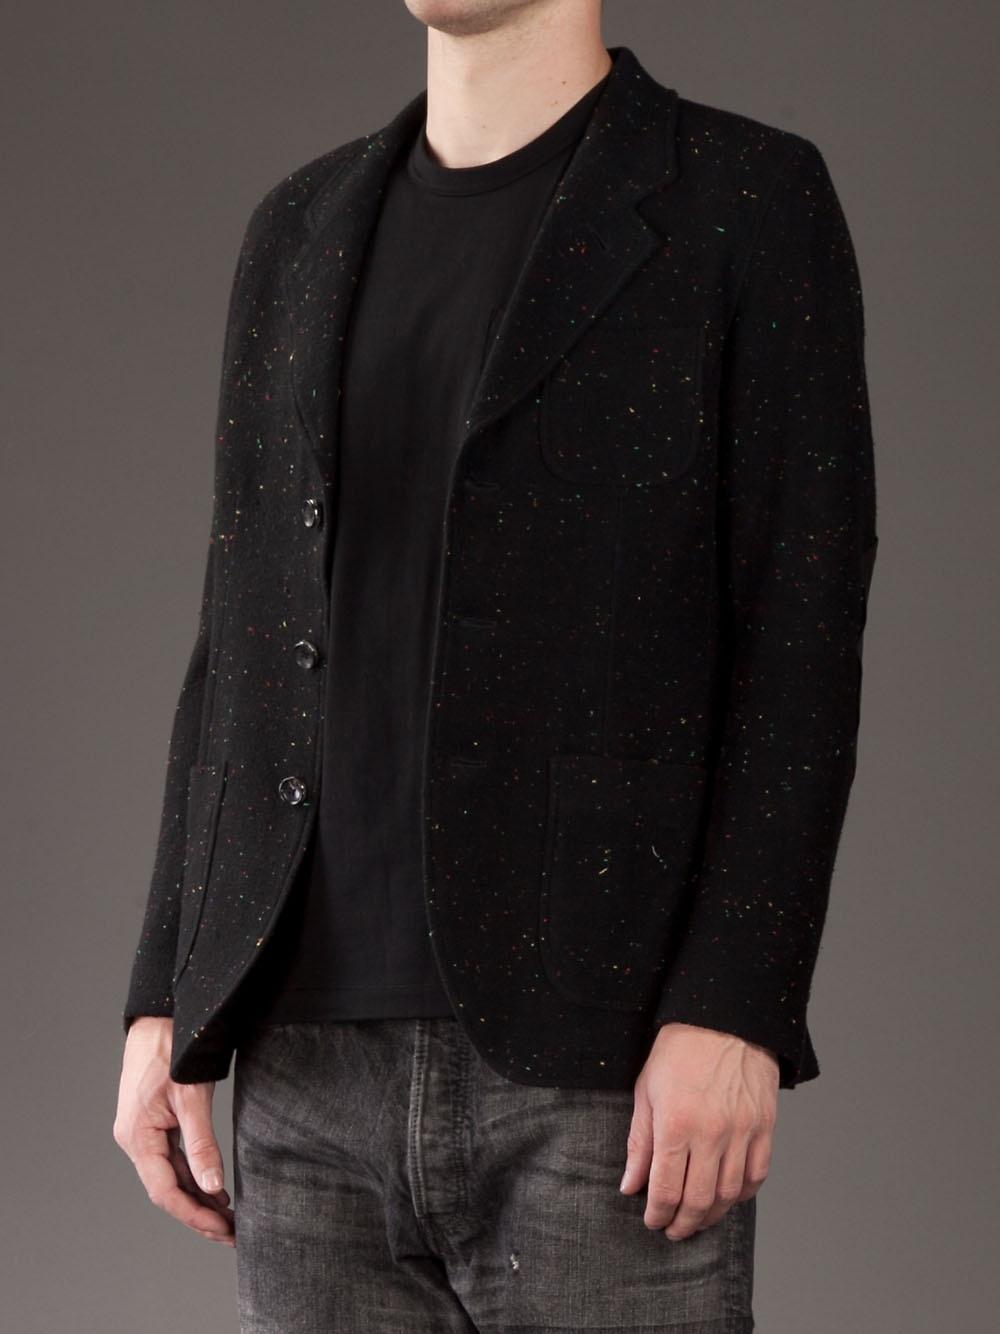 000d8f4bfd32 in in in Lyst Japan Men Blazer Black Black Black Black Unstructured for  Mastermind S4ZAUW